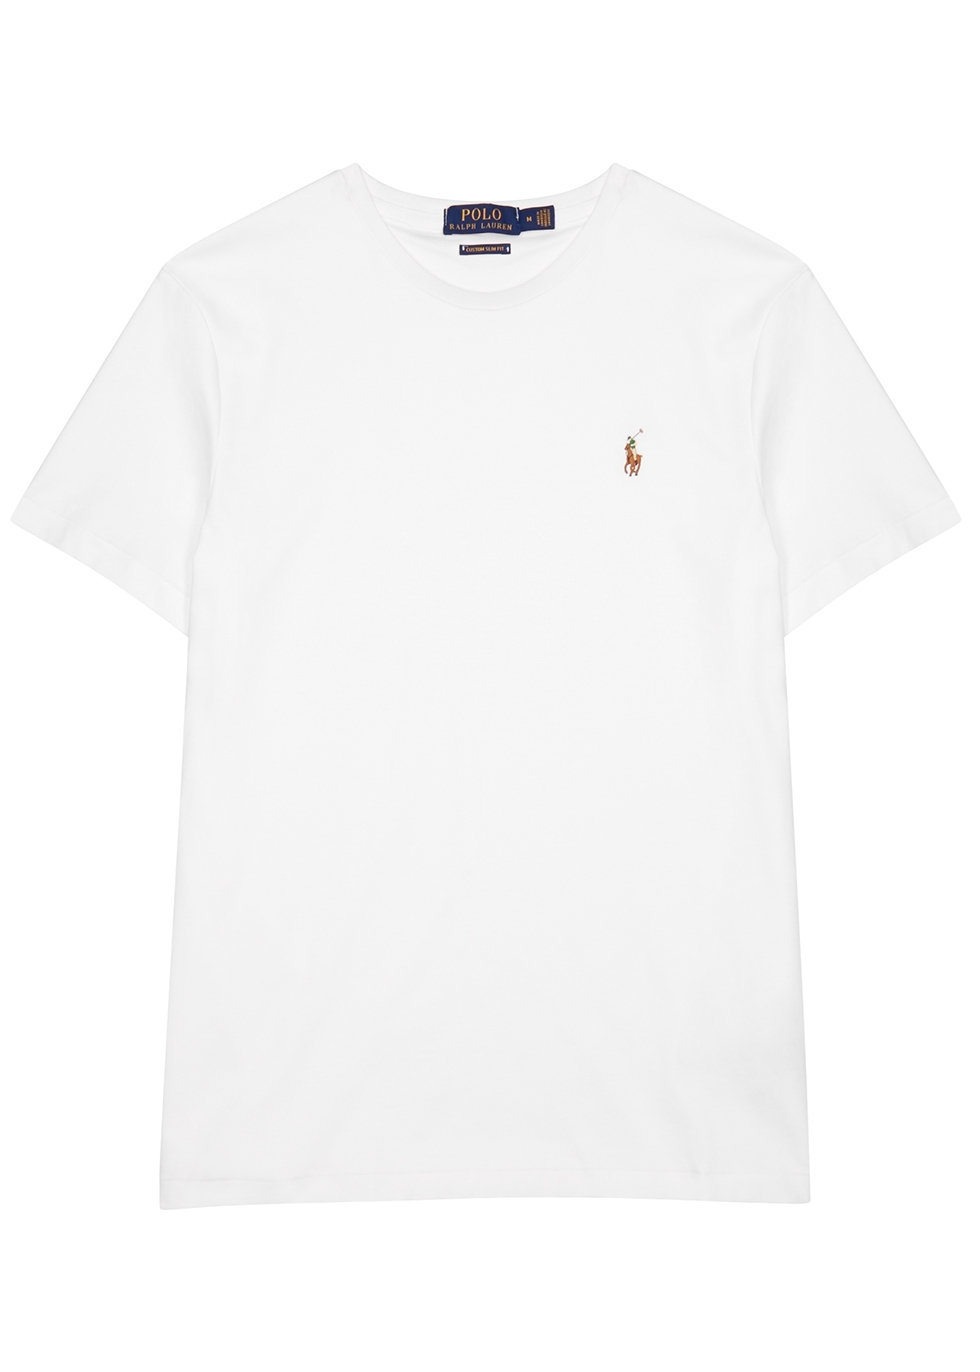 e1e55b75 Polo Ralph Lauren Polo Shirts, T-Shirts, Jumpers - Harvey Nichols